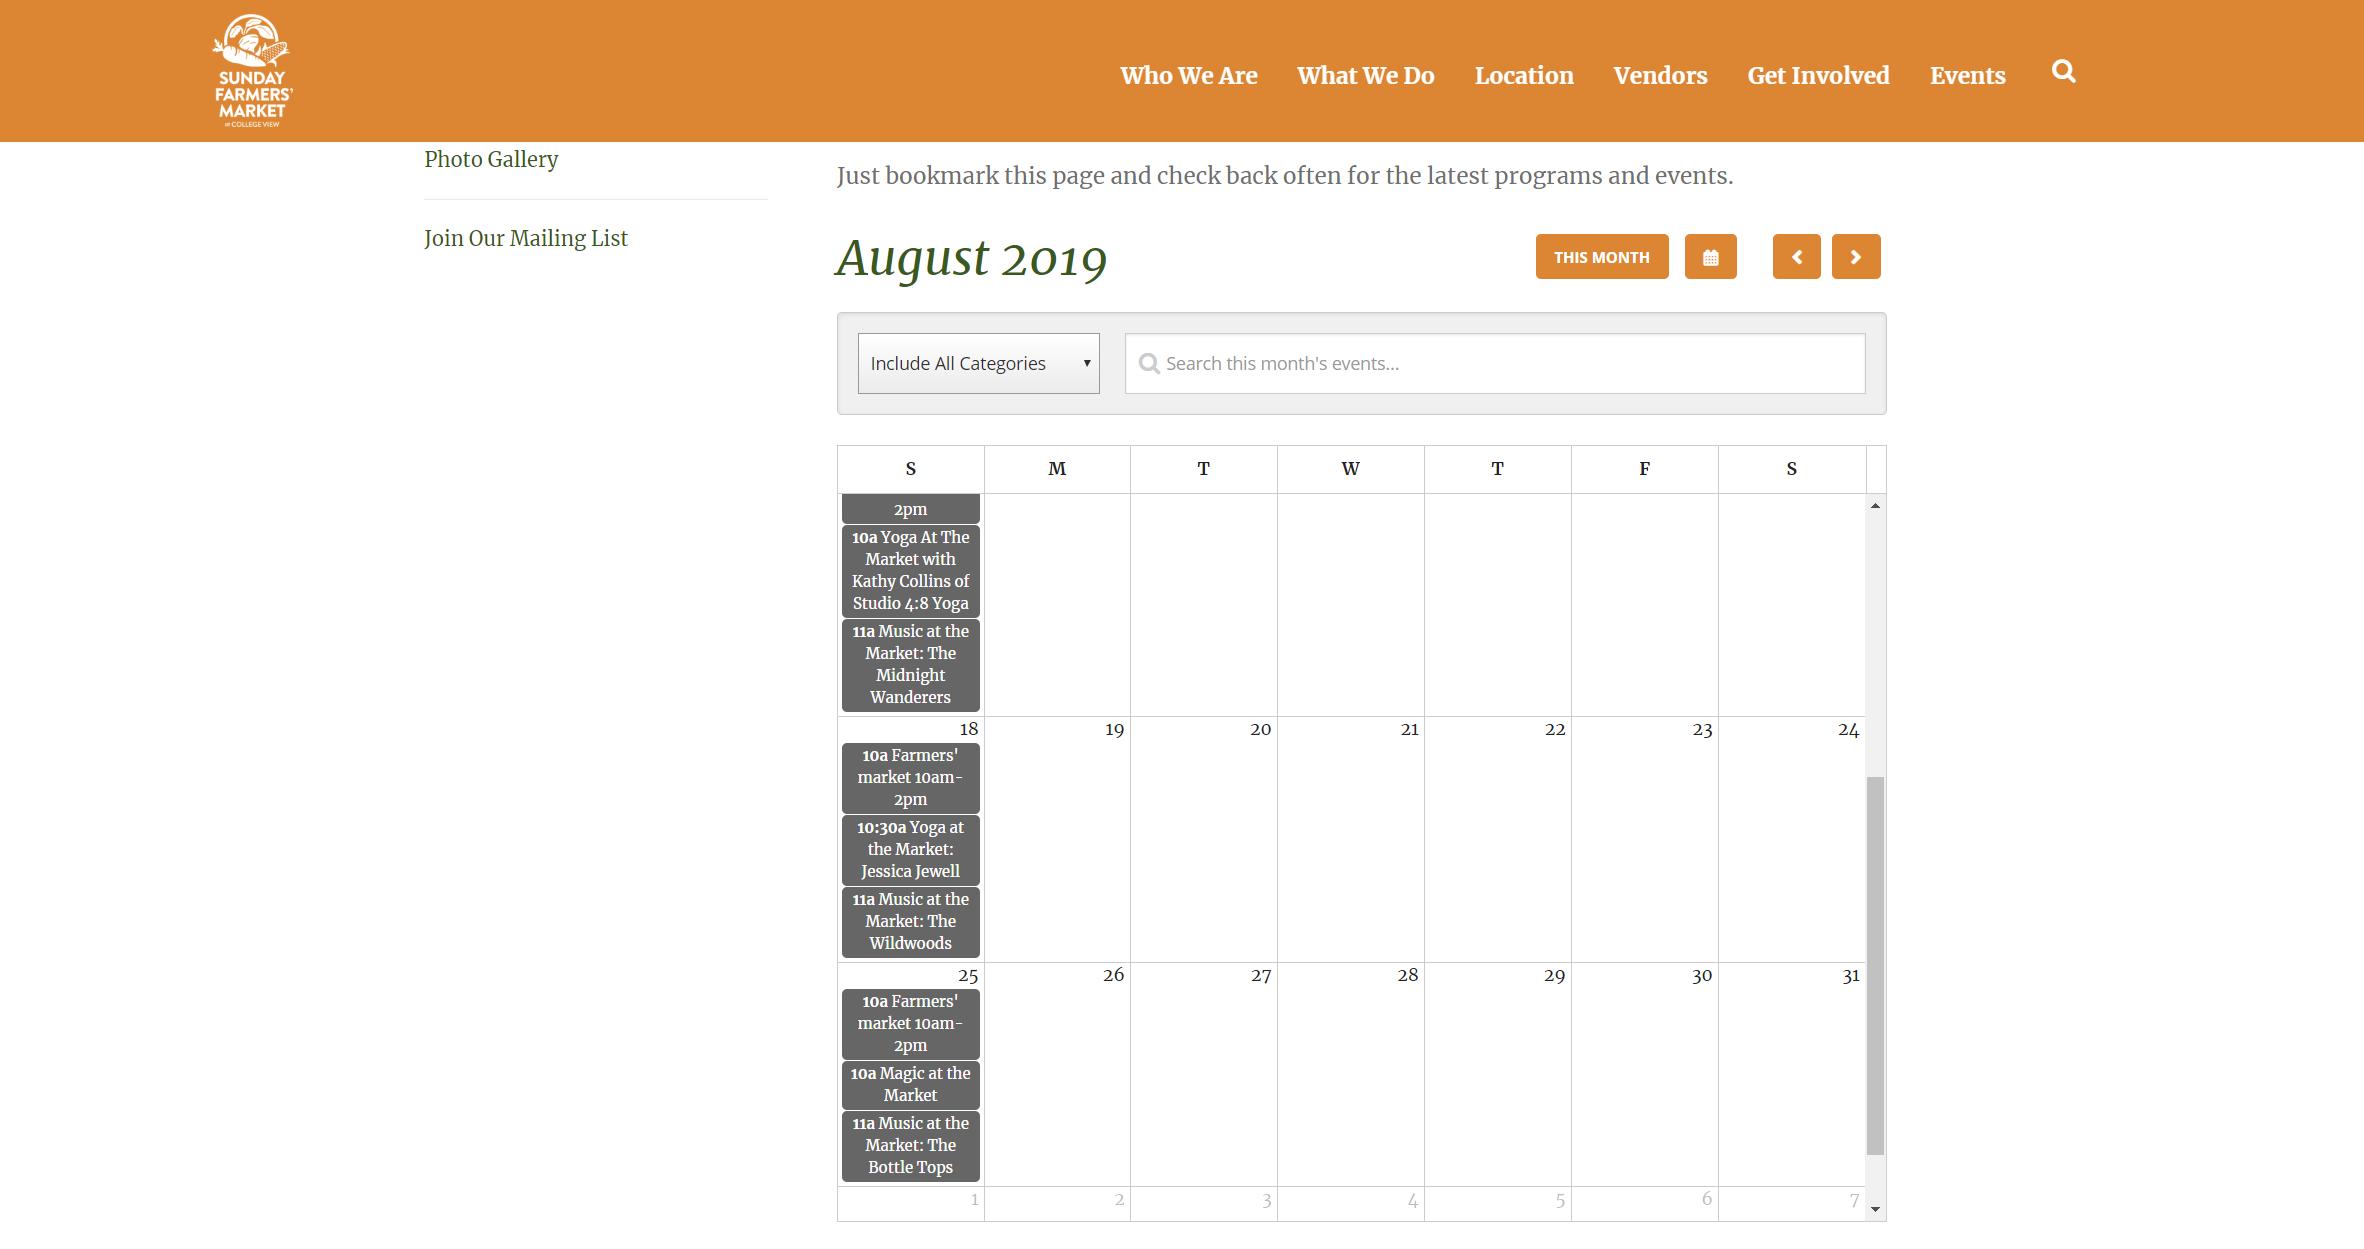 Screenshot 2019-08-07 15.58.56.png